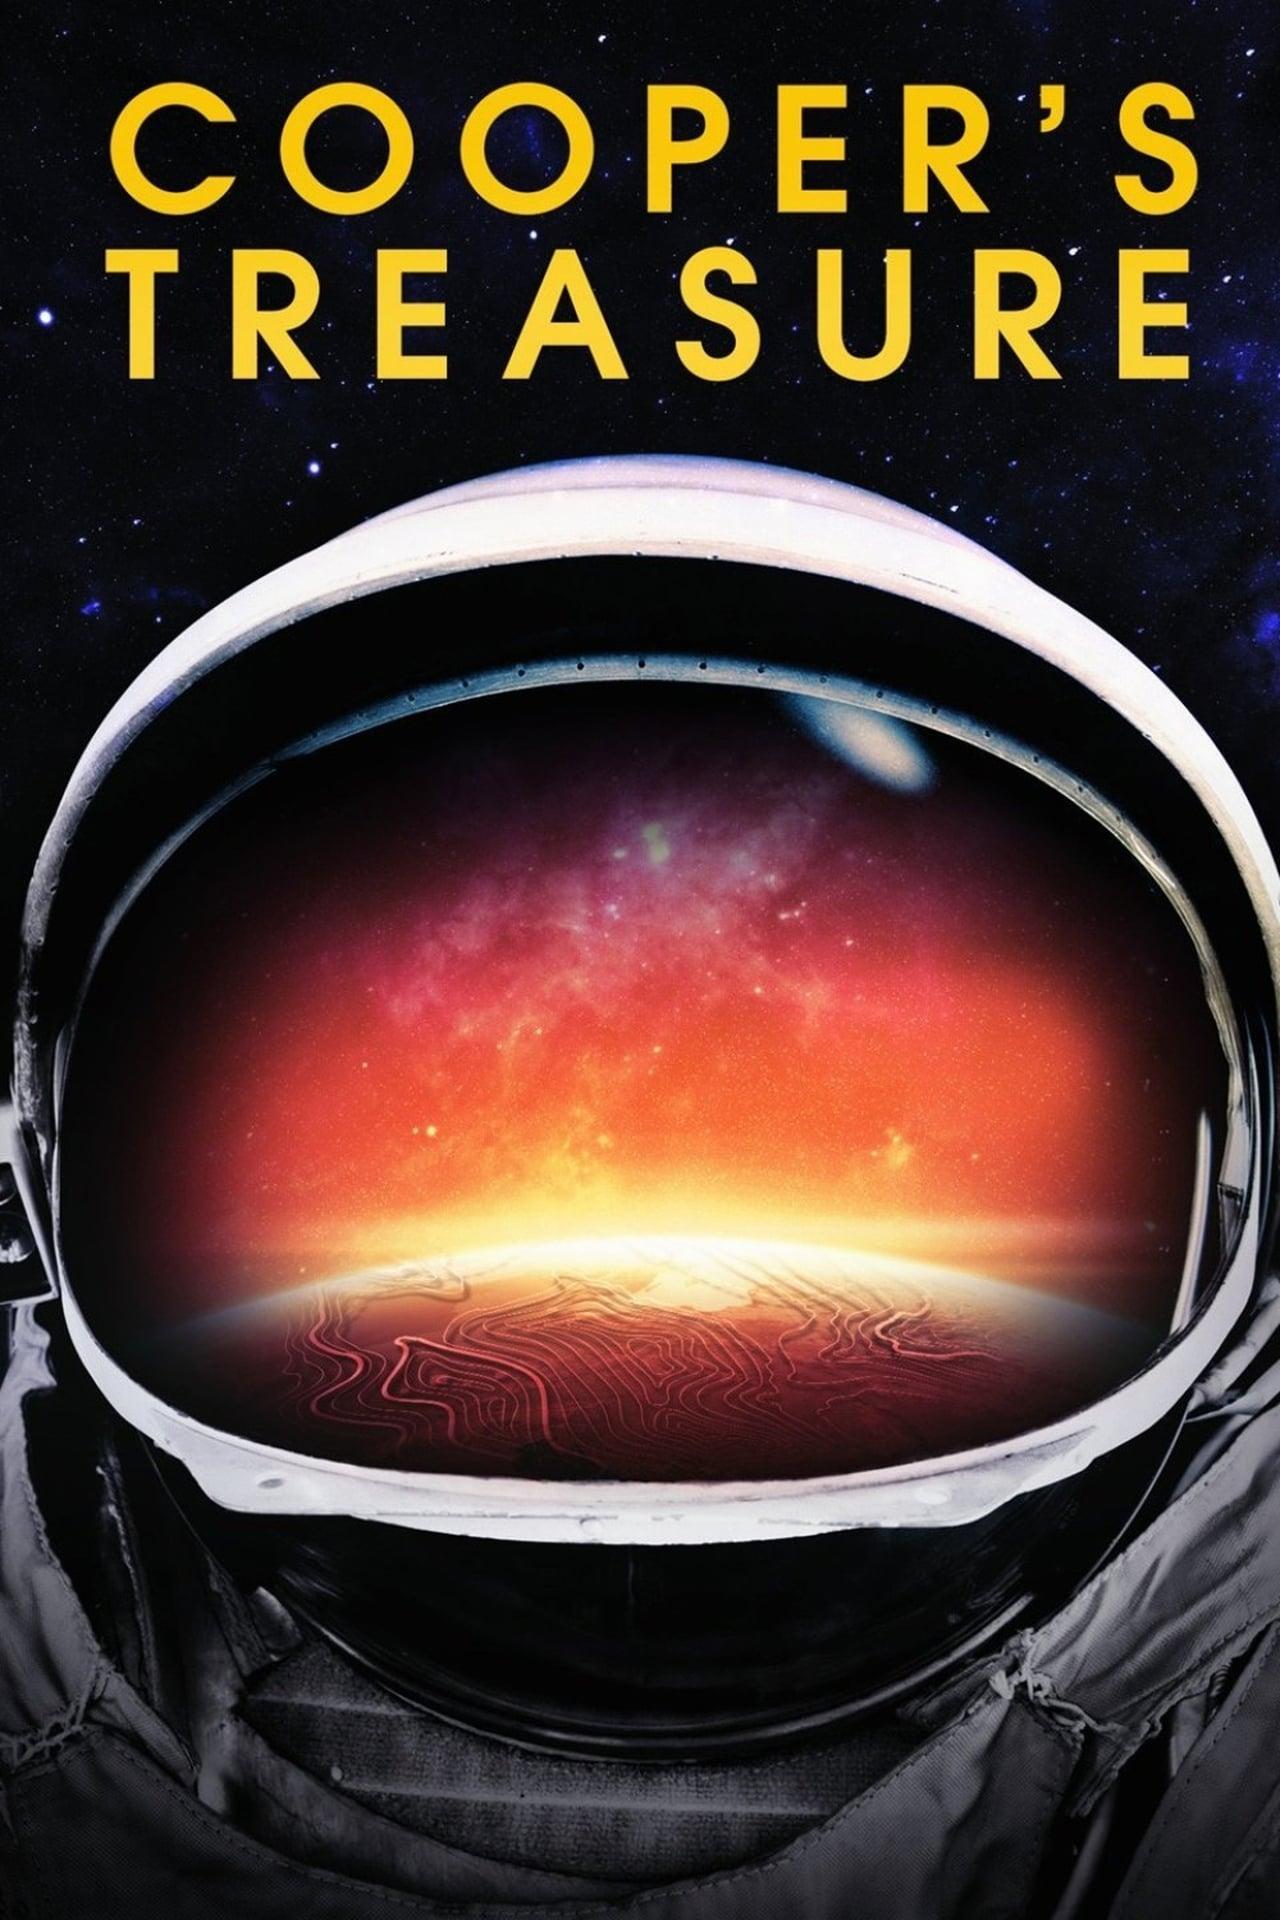 Cooper's Treasure Season 1